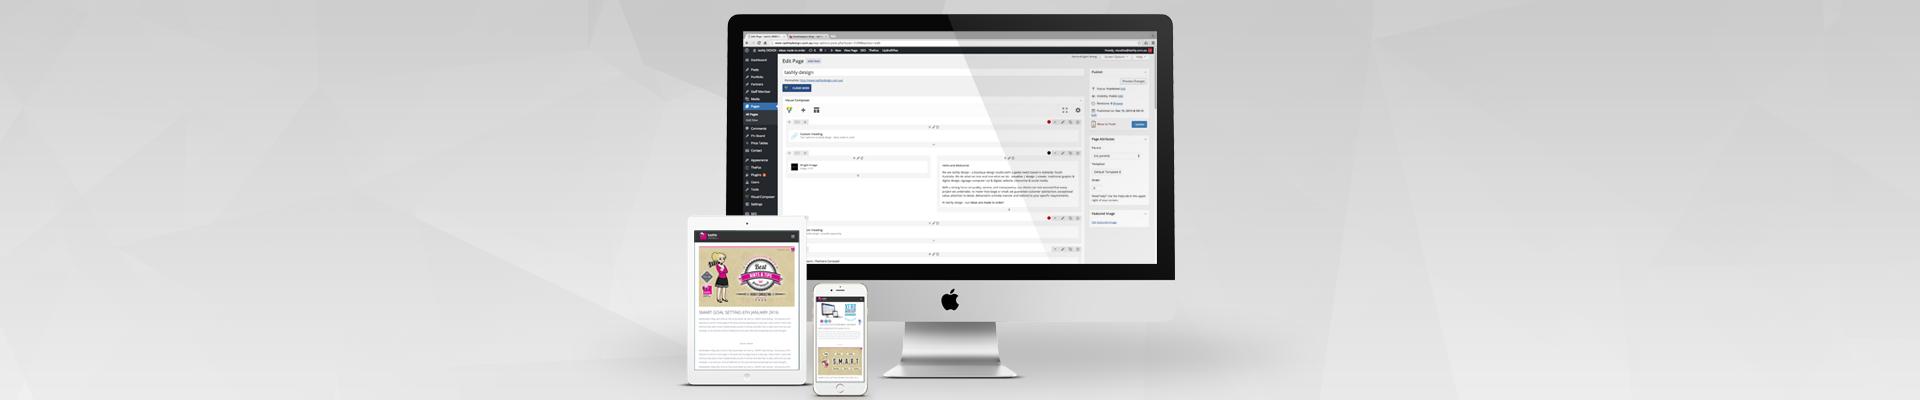 webDesign - powered by wordpress